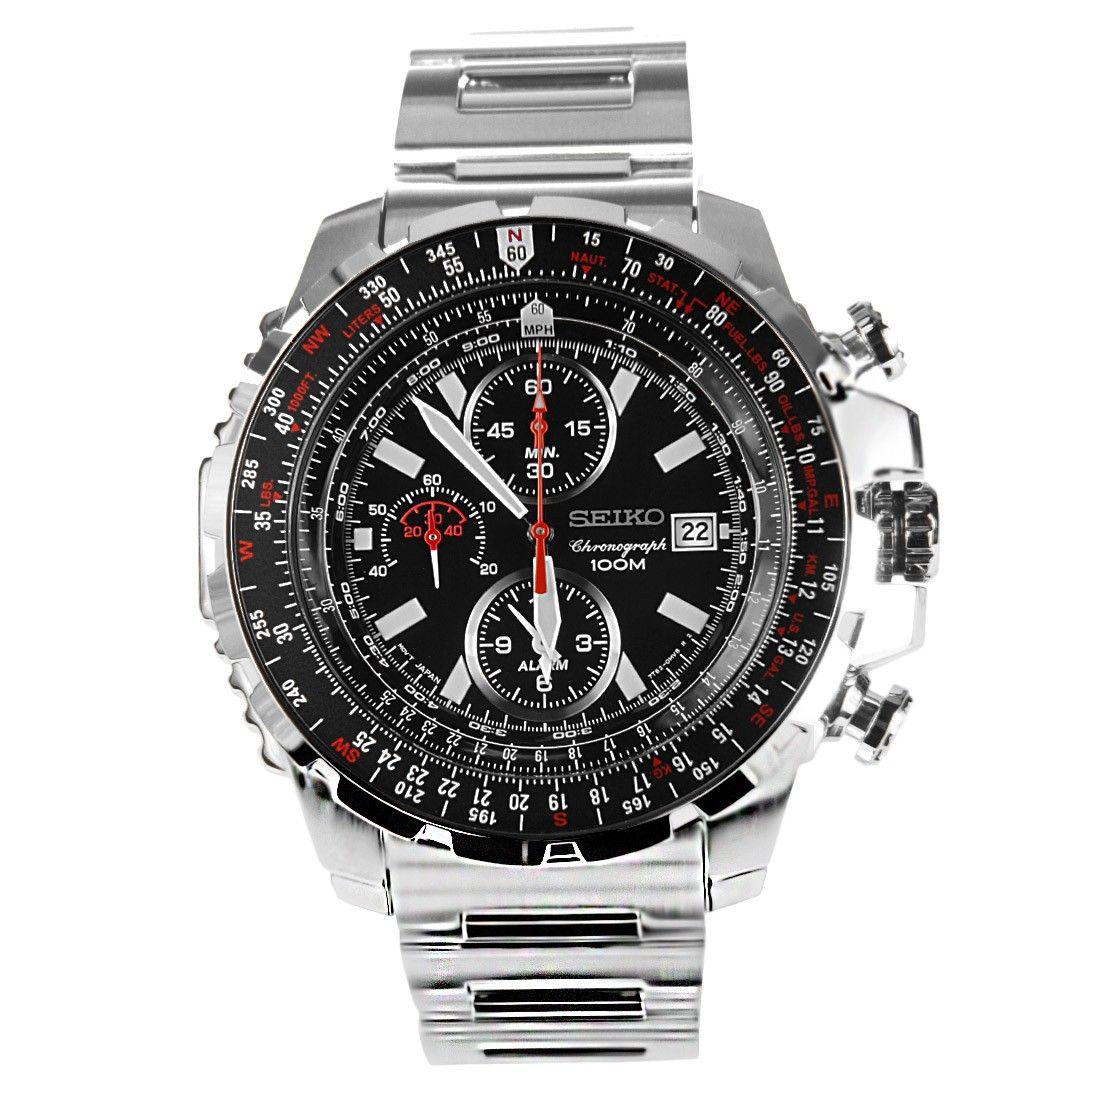 SNAD05 Seiko Chronograph Pilot Flight Master Watch